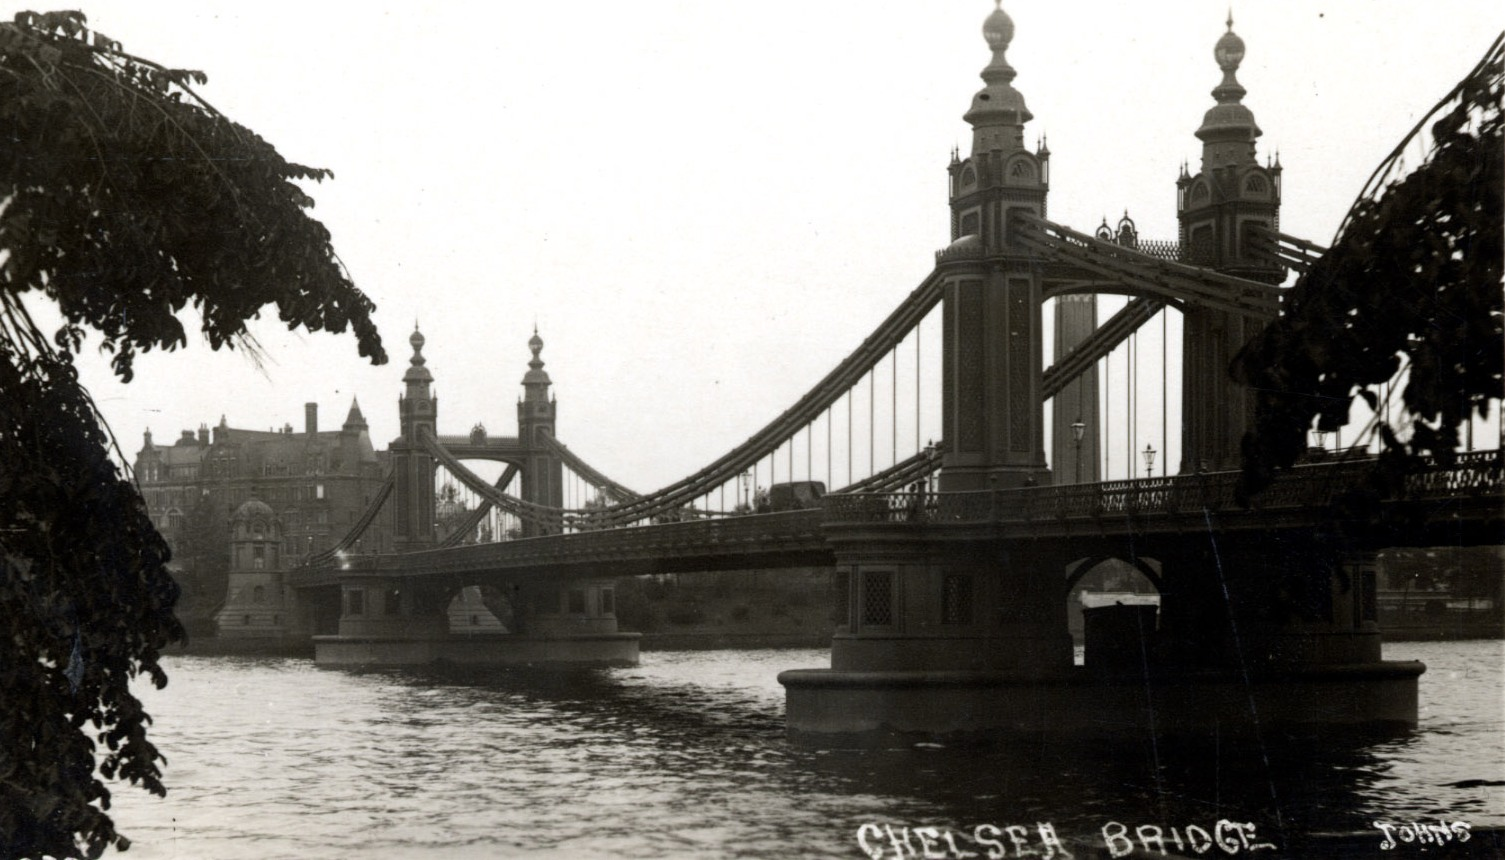 Building The Chelsea Bridge 1936 Vintage Everyday